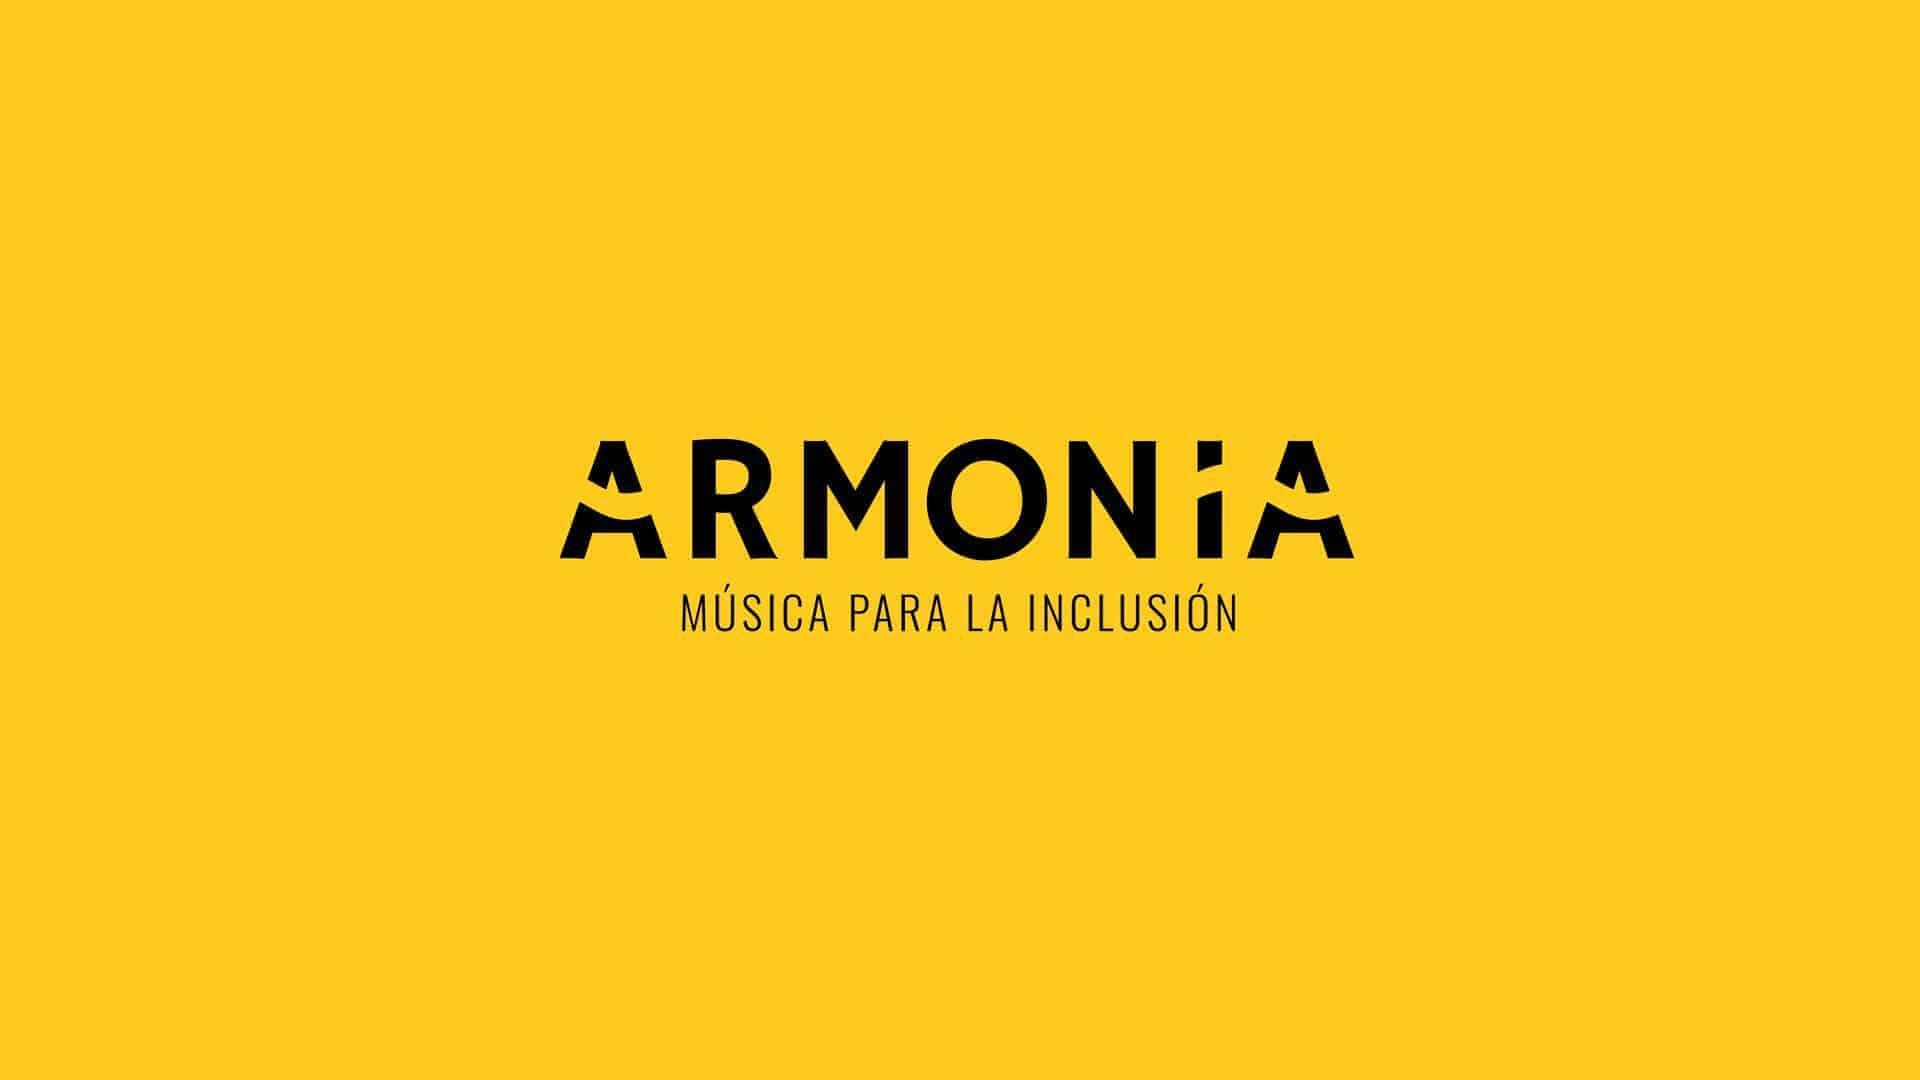 Armonía - Music for Inclusion